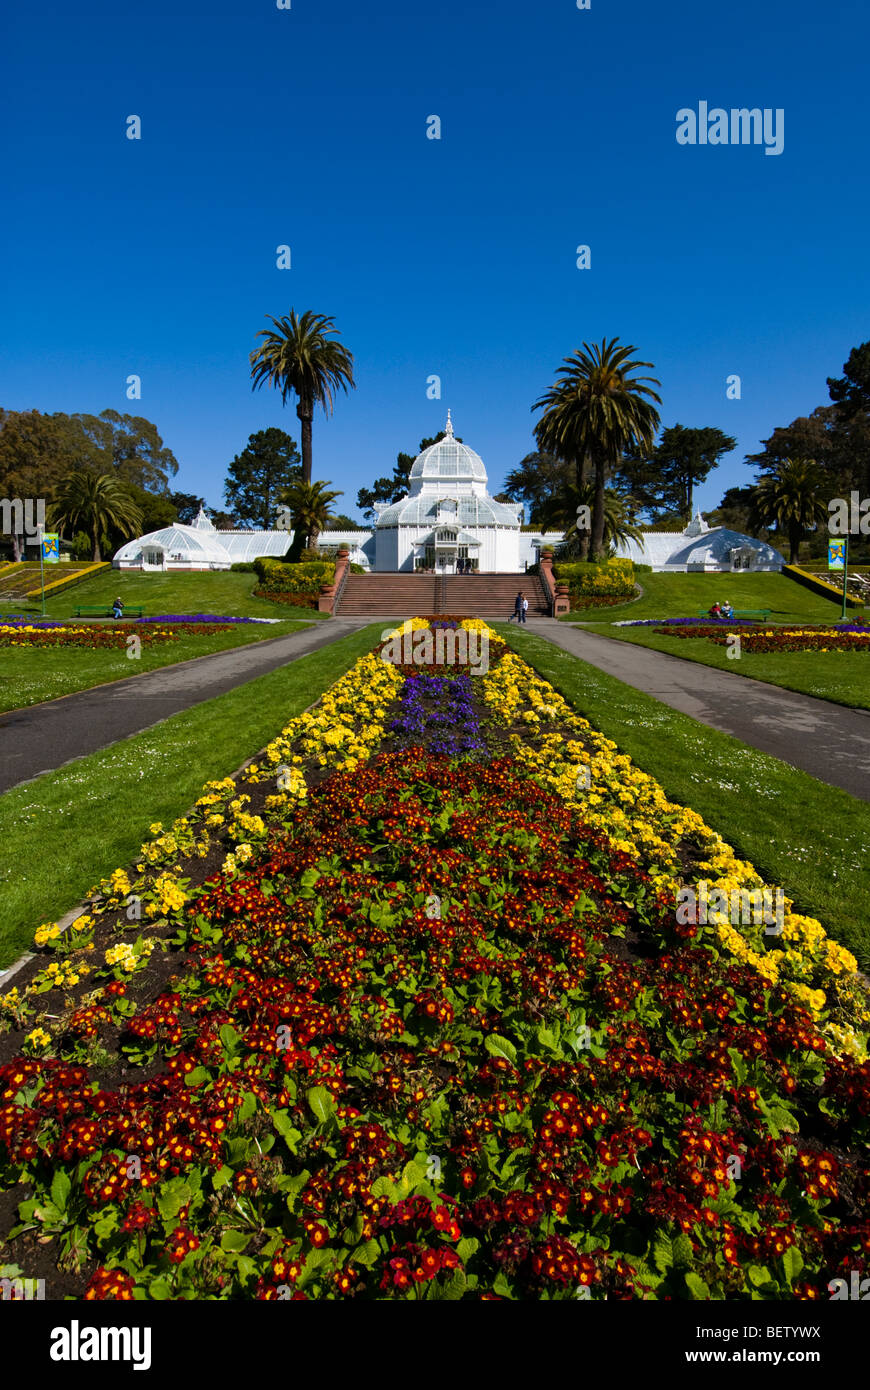 Golden Gate Park San Francisco Stock Photos & Golden Gate Park San ...